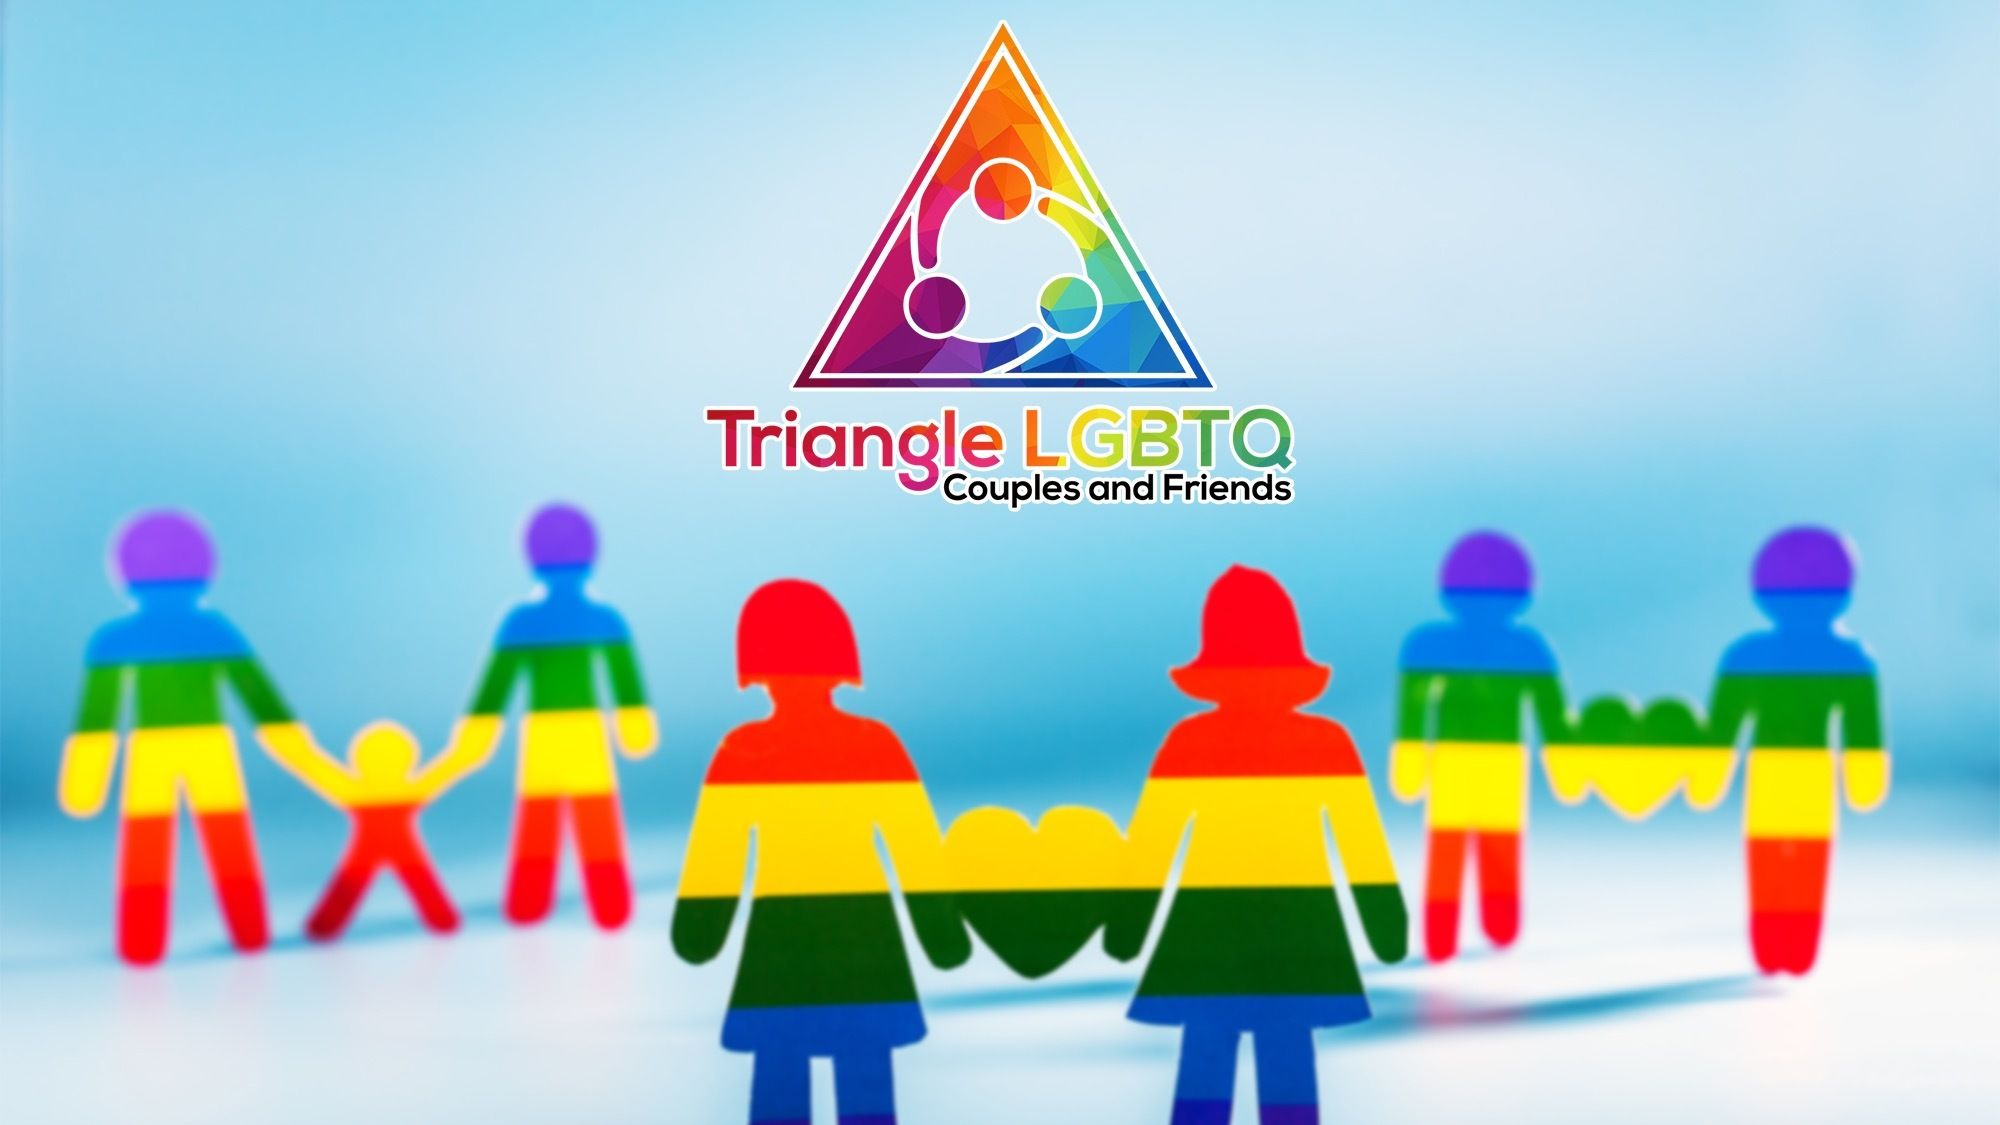 Triangle LGBTQ Couples & Friends